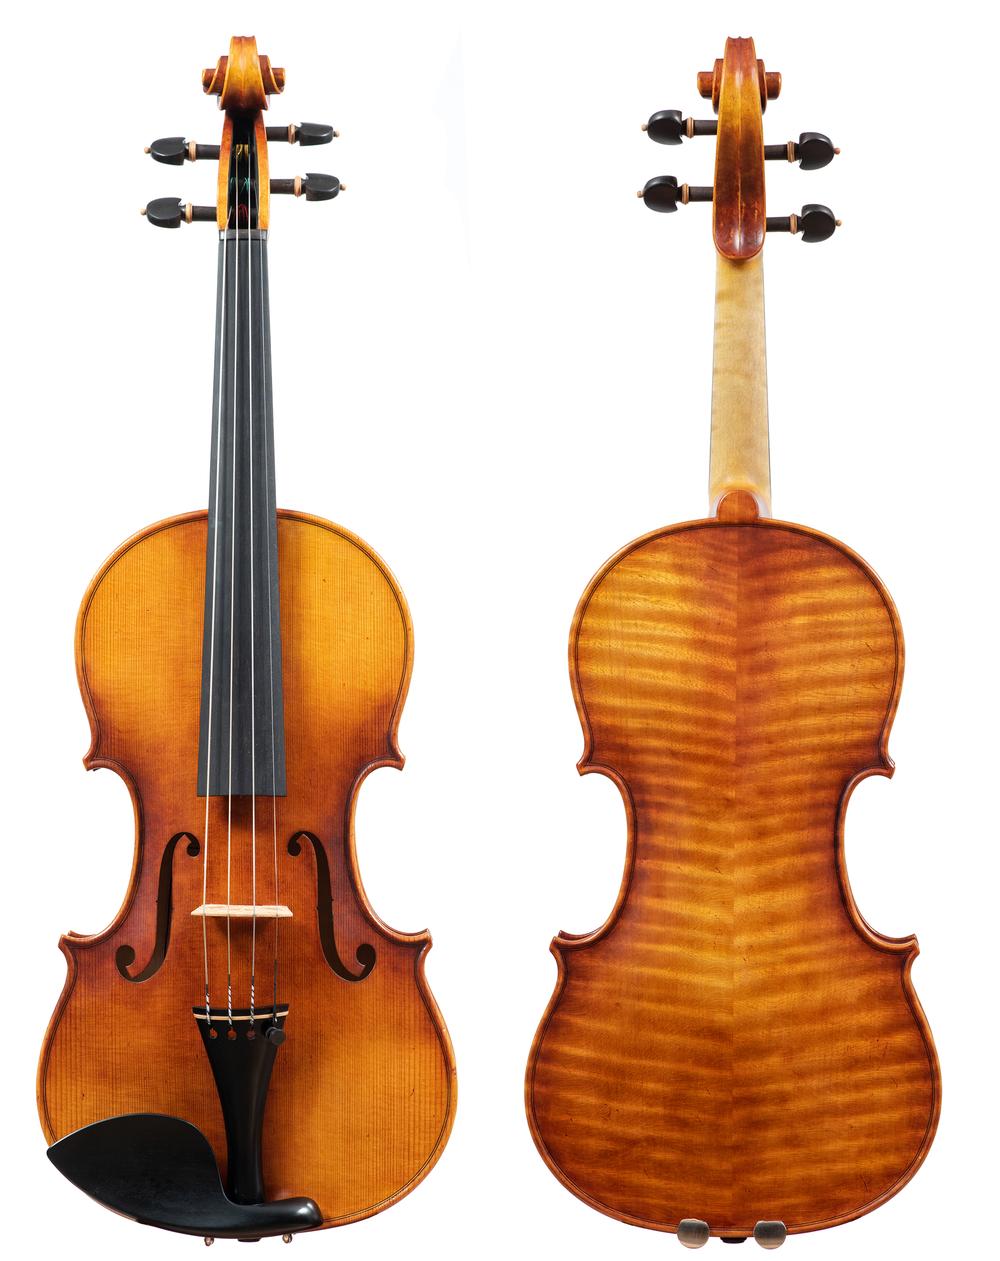 Bandila Virgil Violin